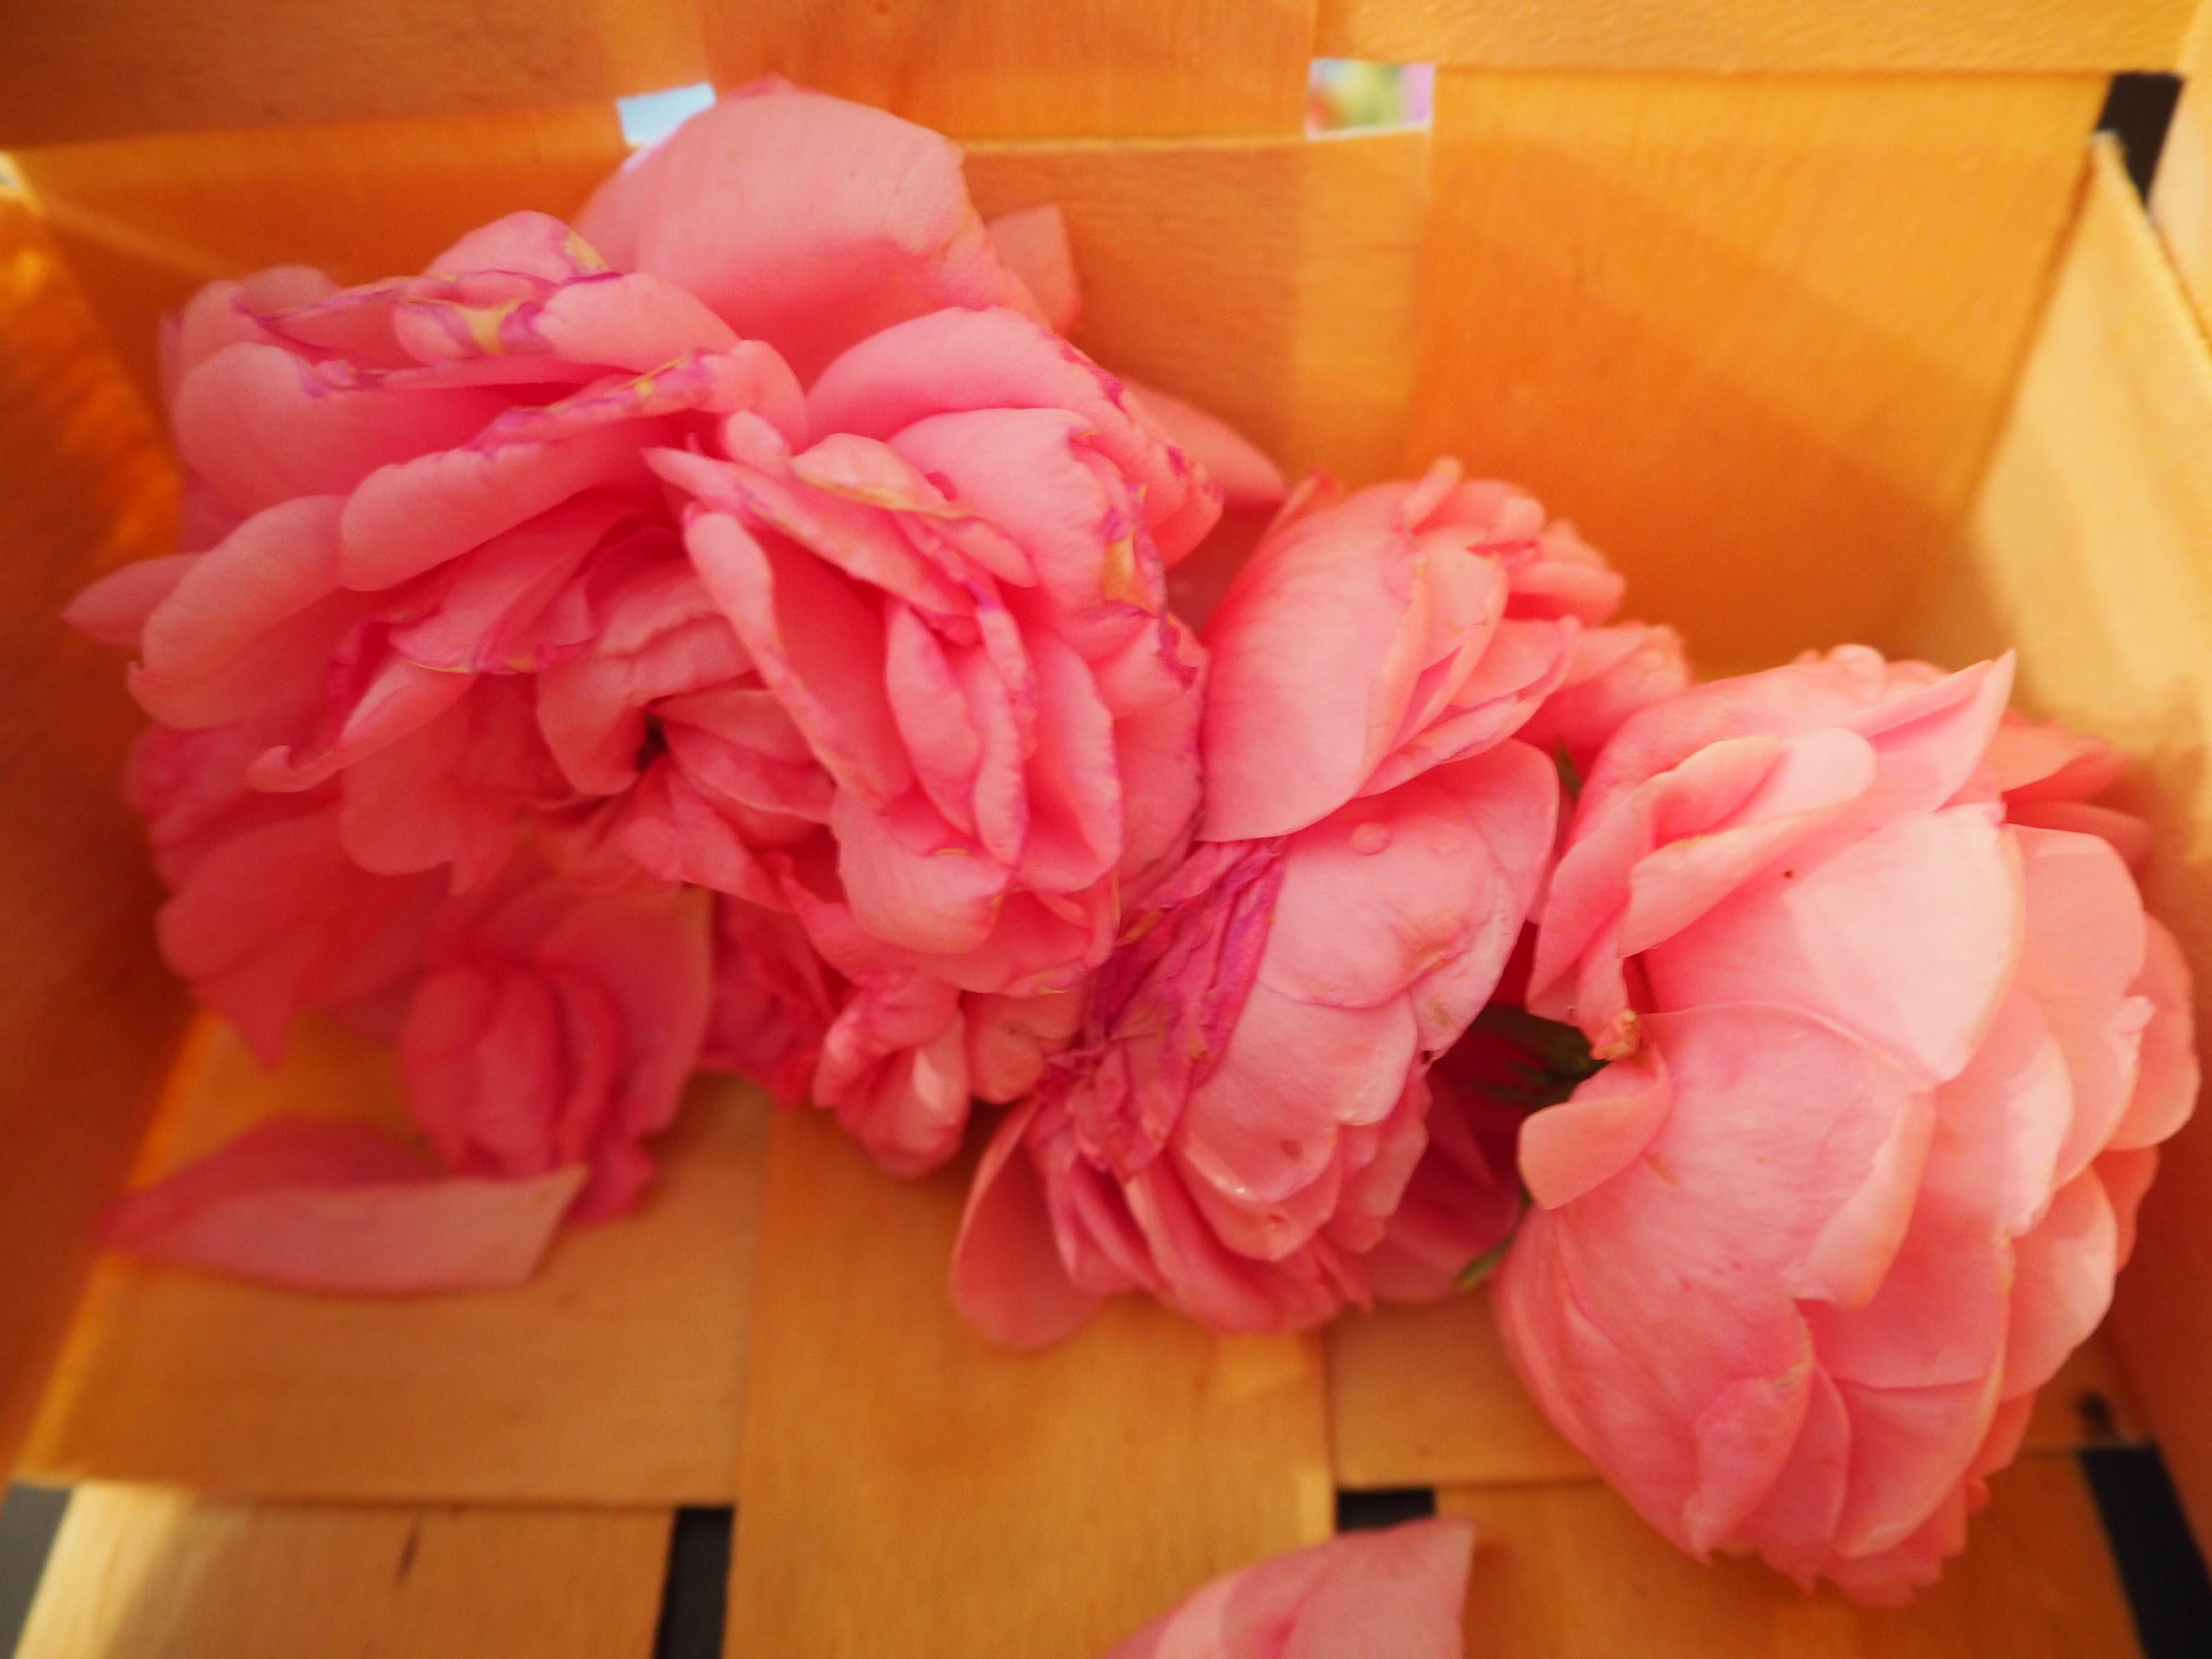 hydrolate aus damaszener rosen selbst destillieren 23 juni 2017. Black Bedroom Furniture Sets. Home Design Ideas